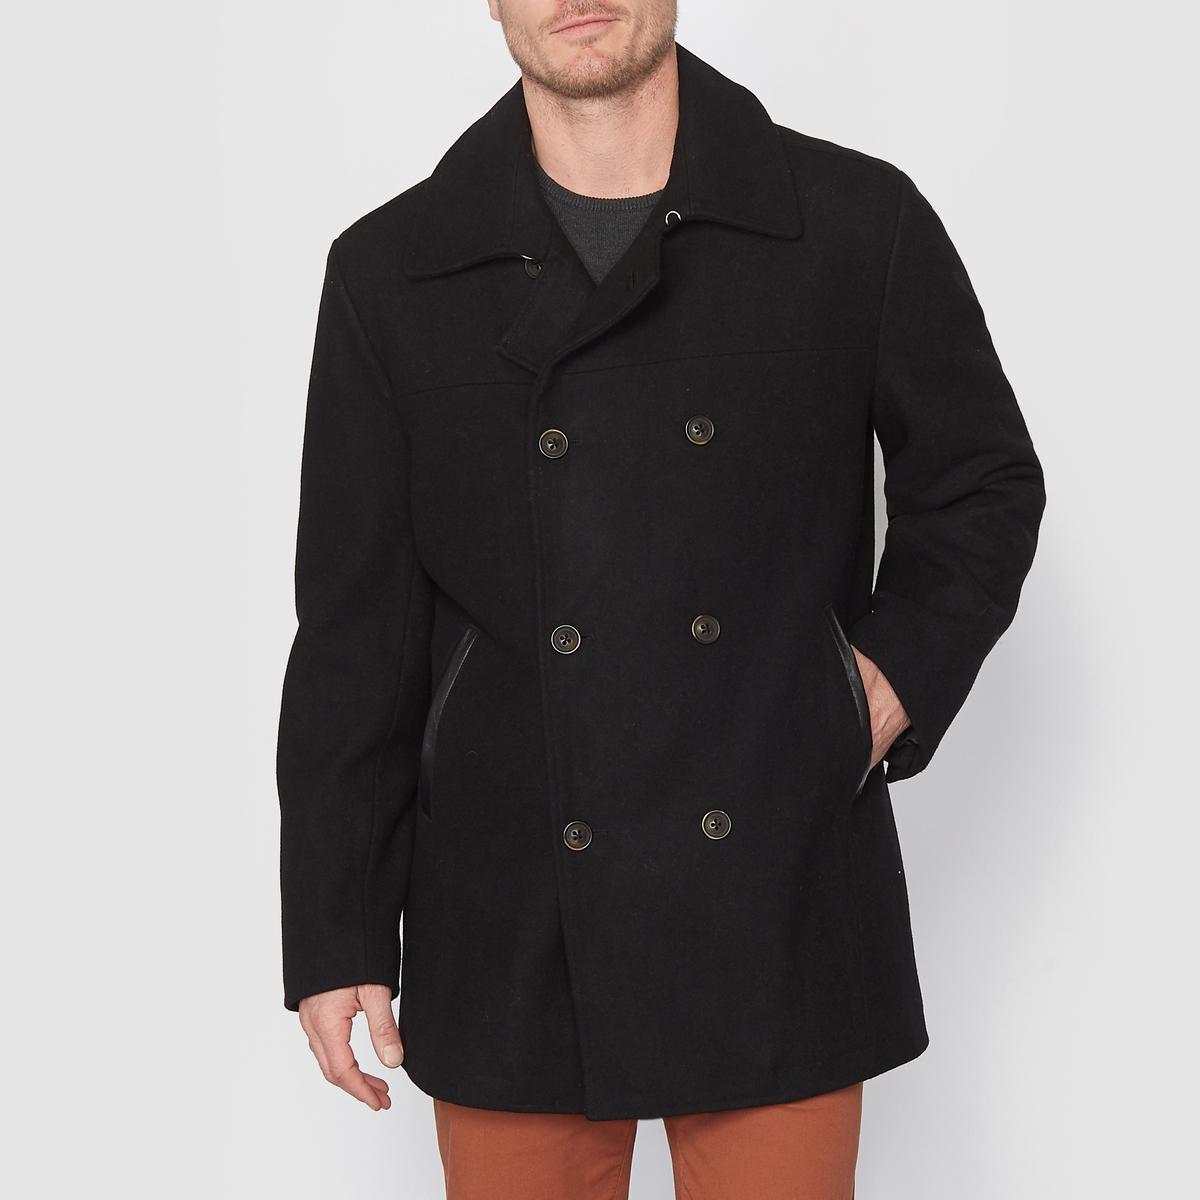 Бушлат из шерстяного драпа пальто зимнее из шерстяного драпа